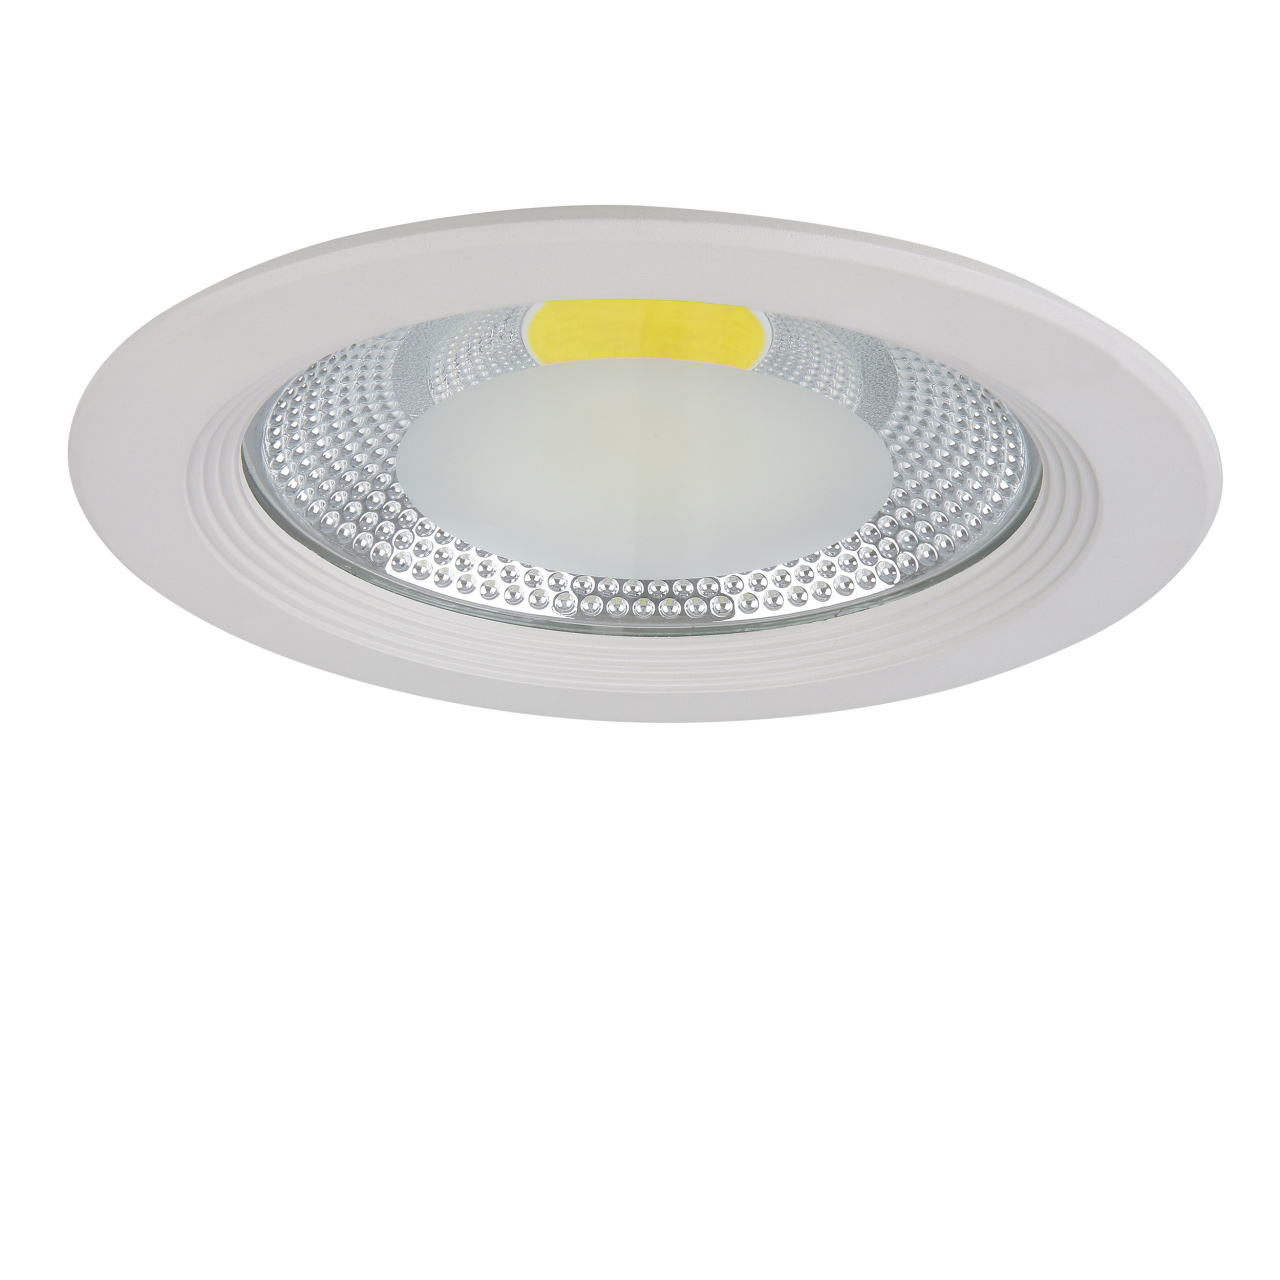 Светильник Forto LED 30W 2850LM 55G 4000K Lightstar 223304